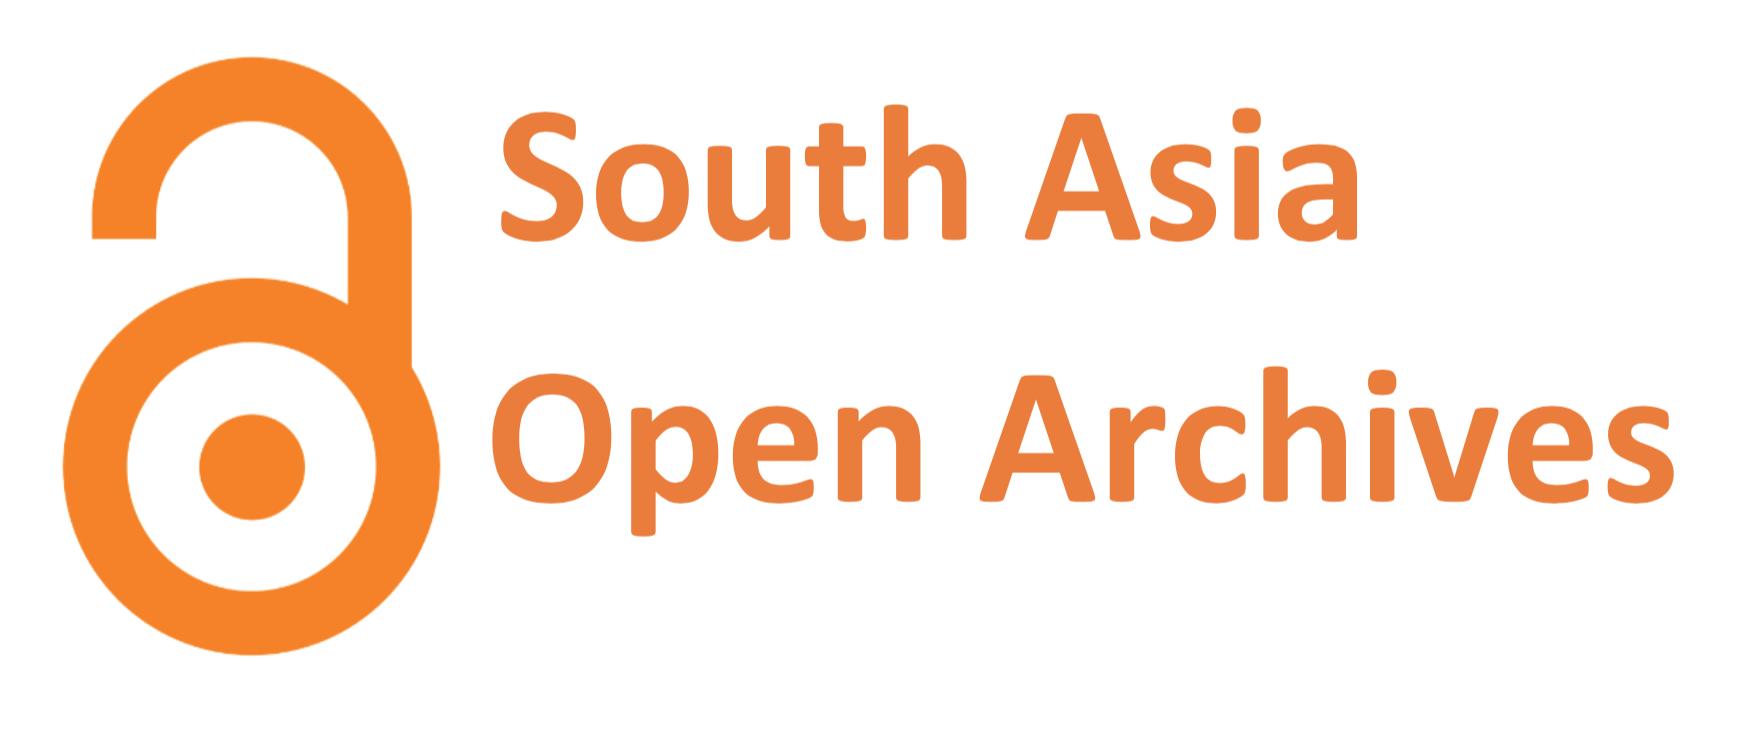 south asia open archives saoa crl